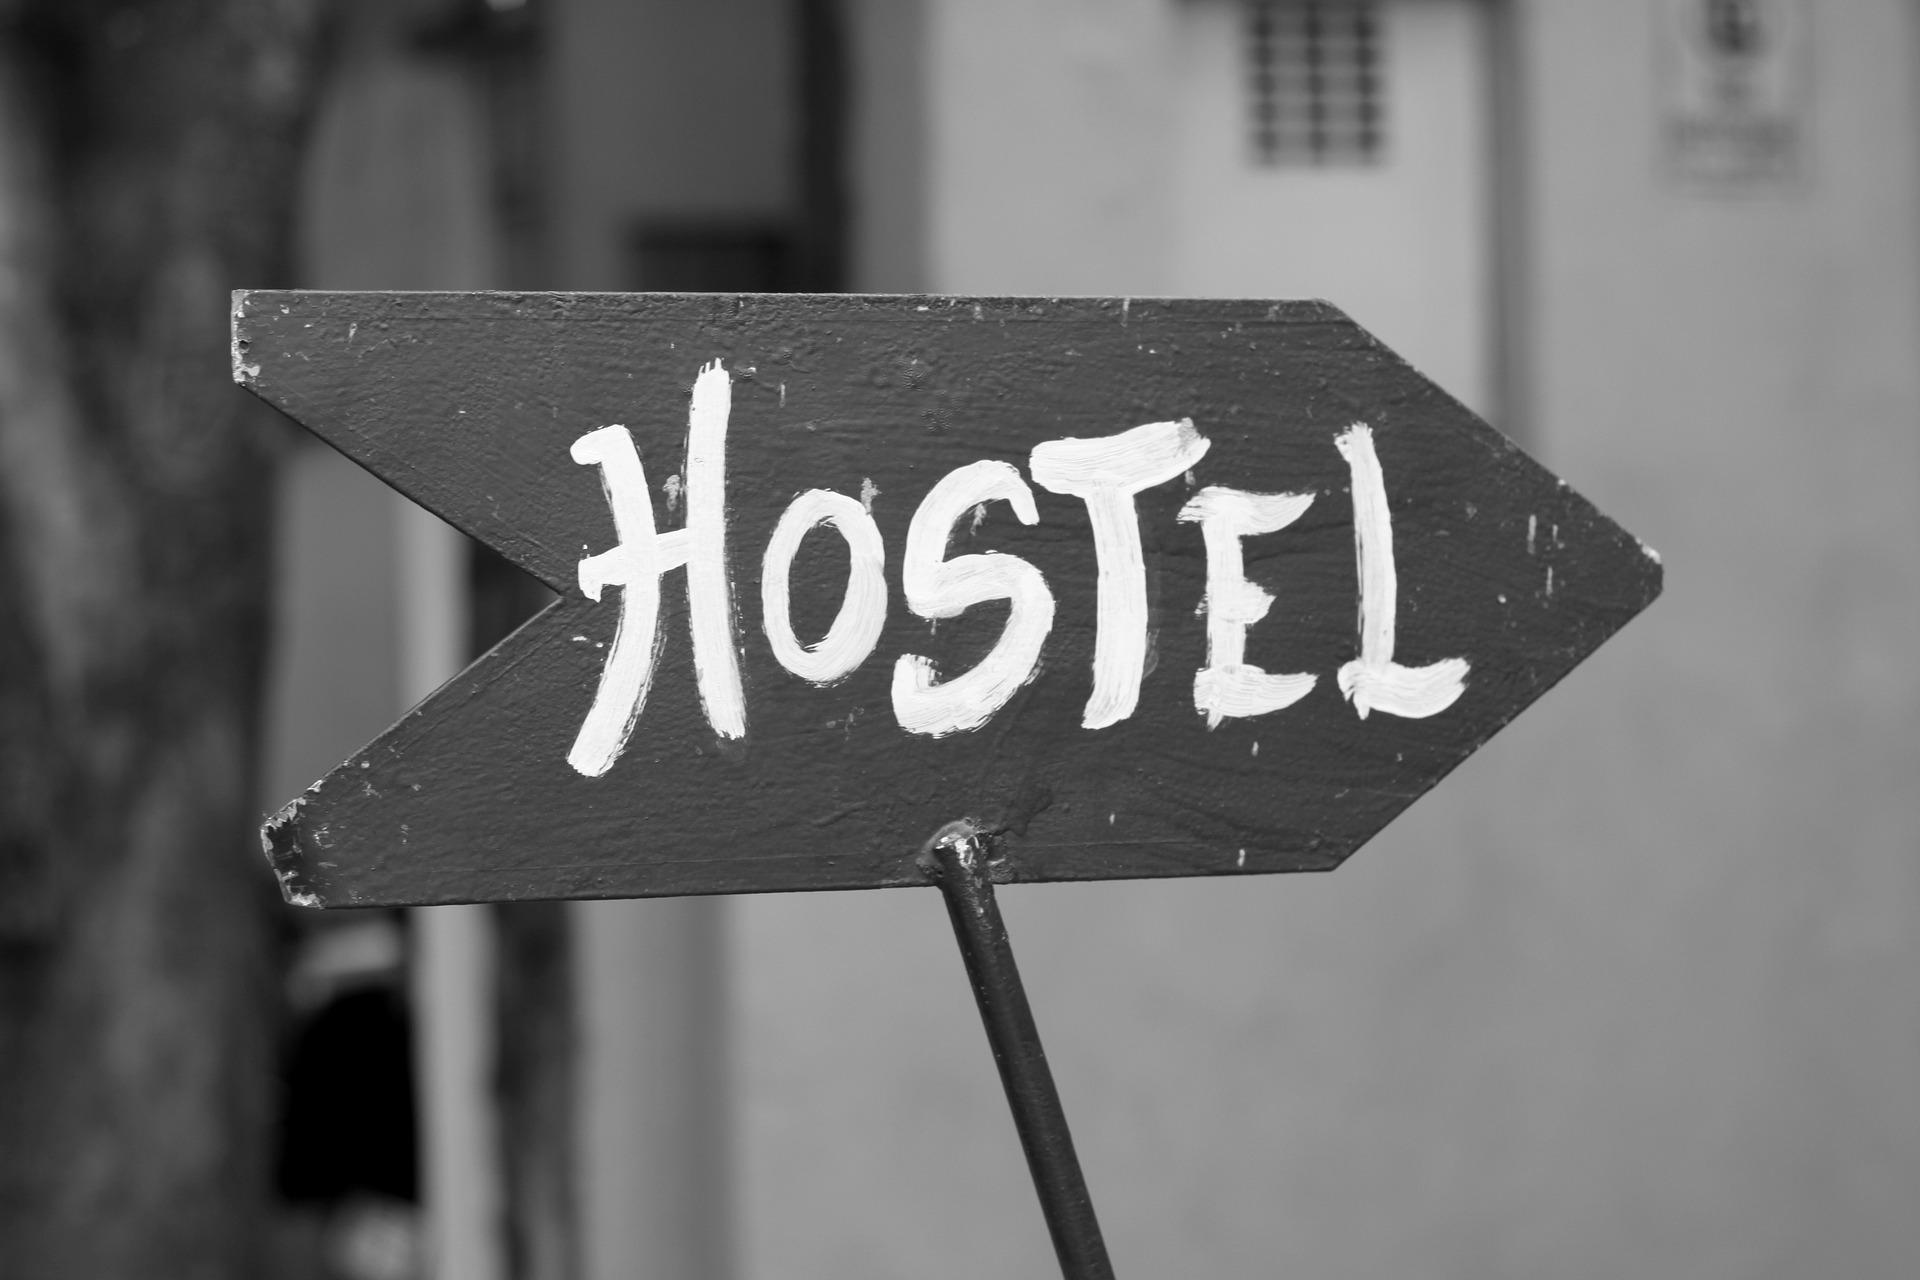 Hostel:  Διαμονή χαλάρωσης ή στιγμές από το ομώνυμο θρίλερ;